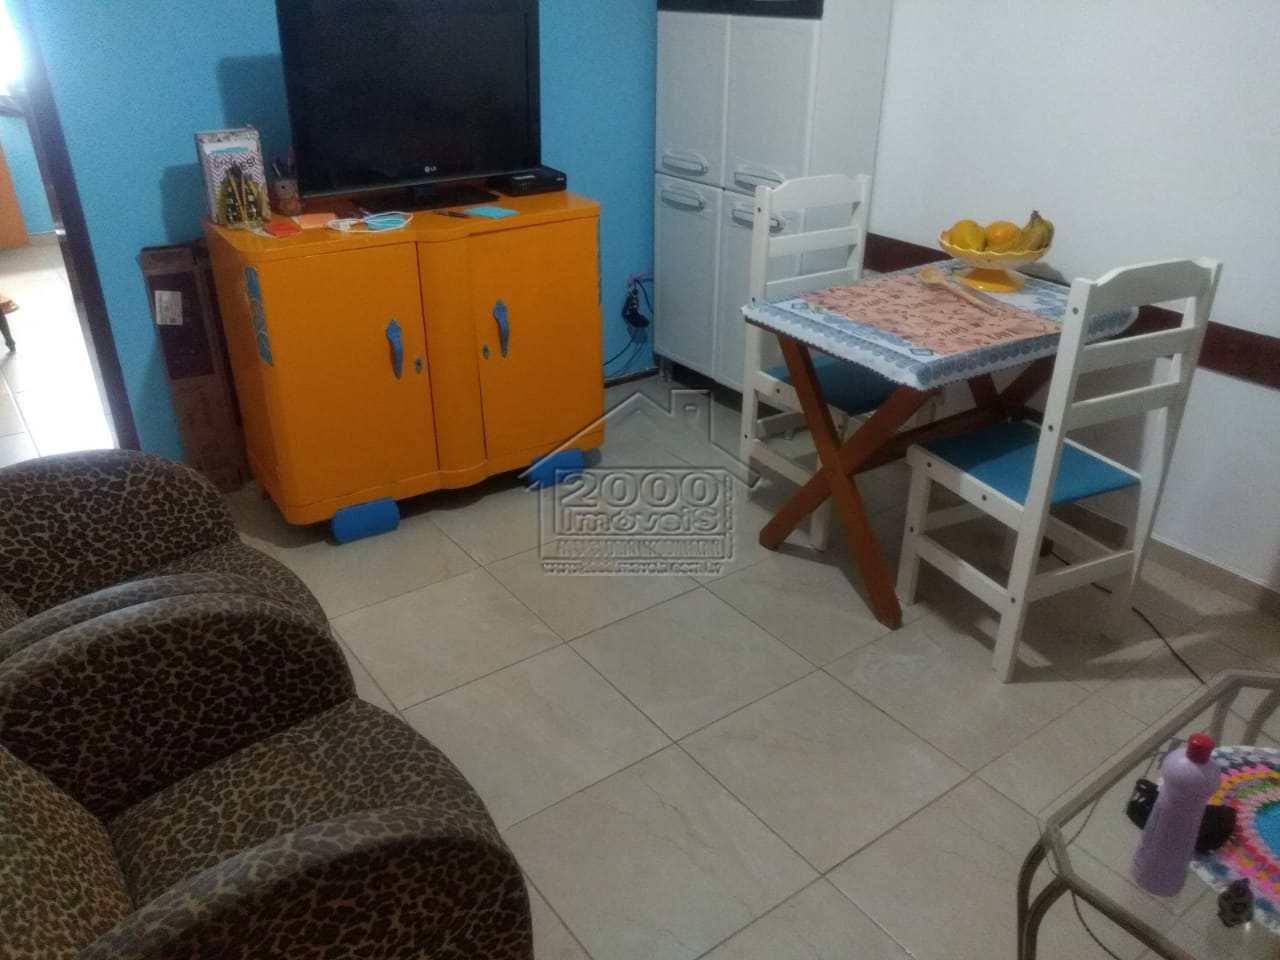 Kitnet com 1 dorm, Guilhermina, Praia Grande - R$ 130 mil, Cod: 2655